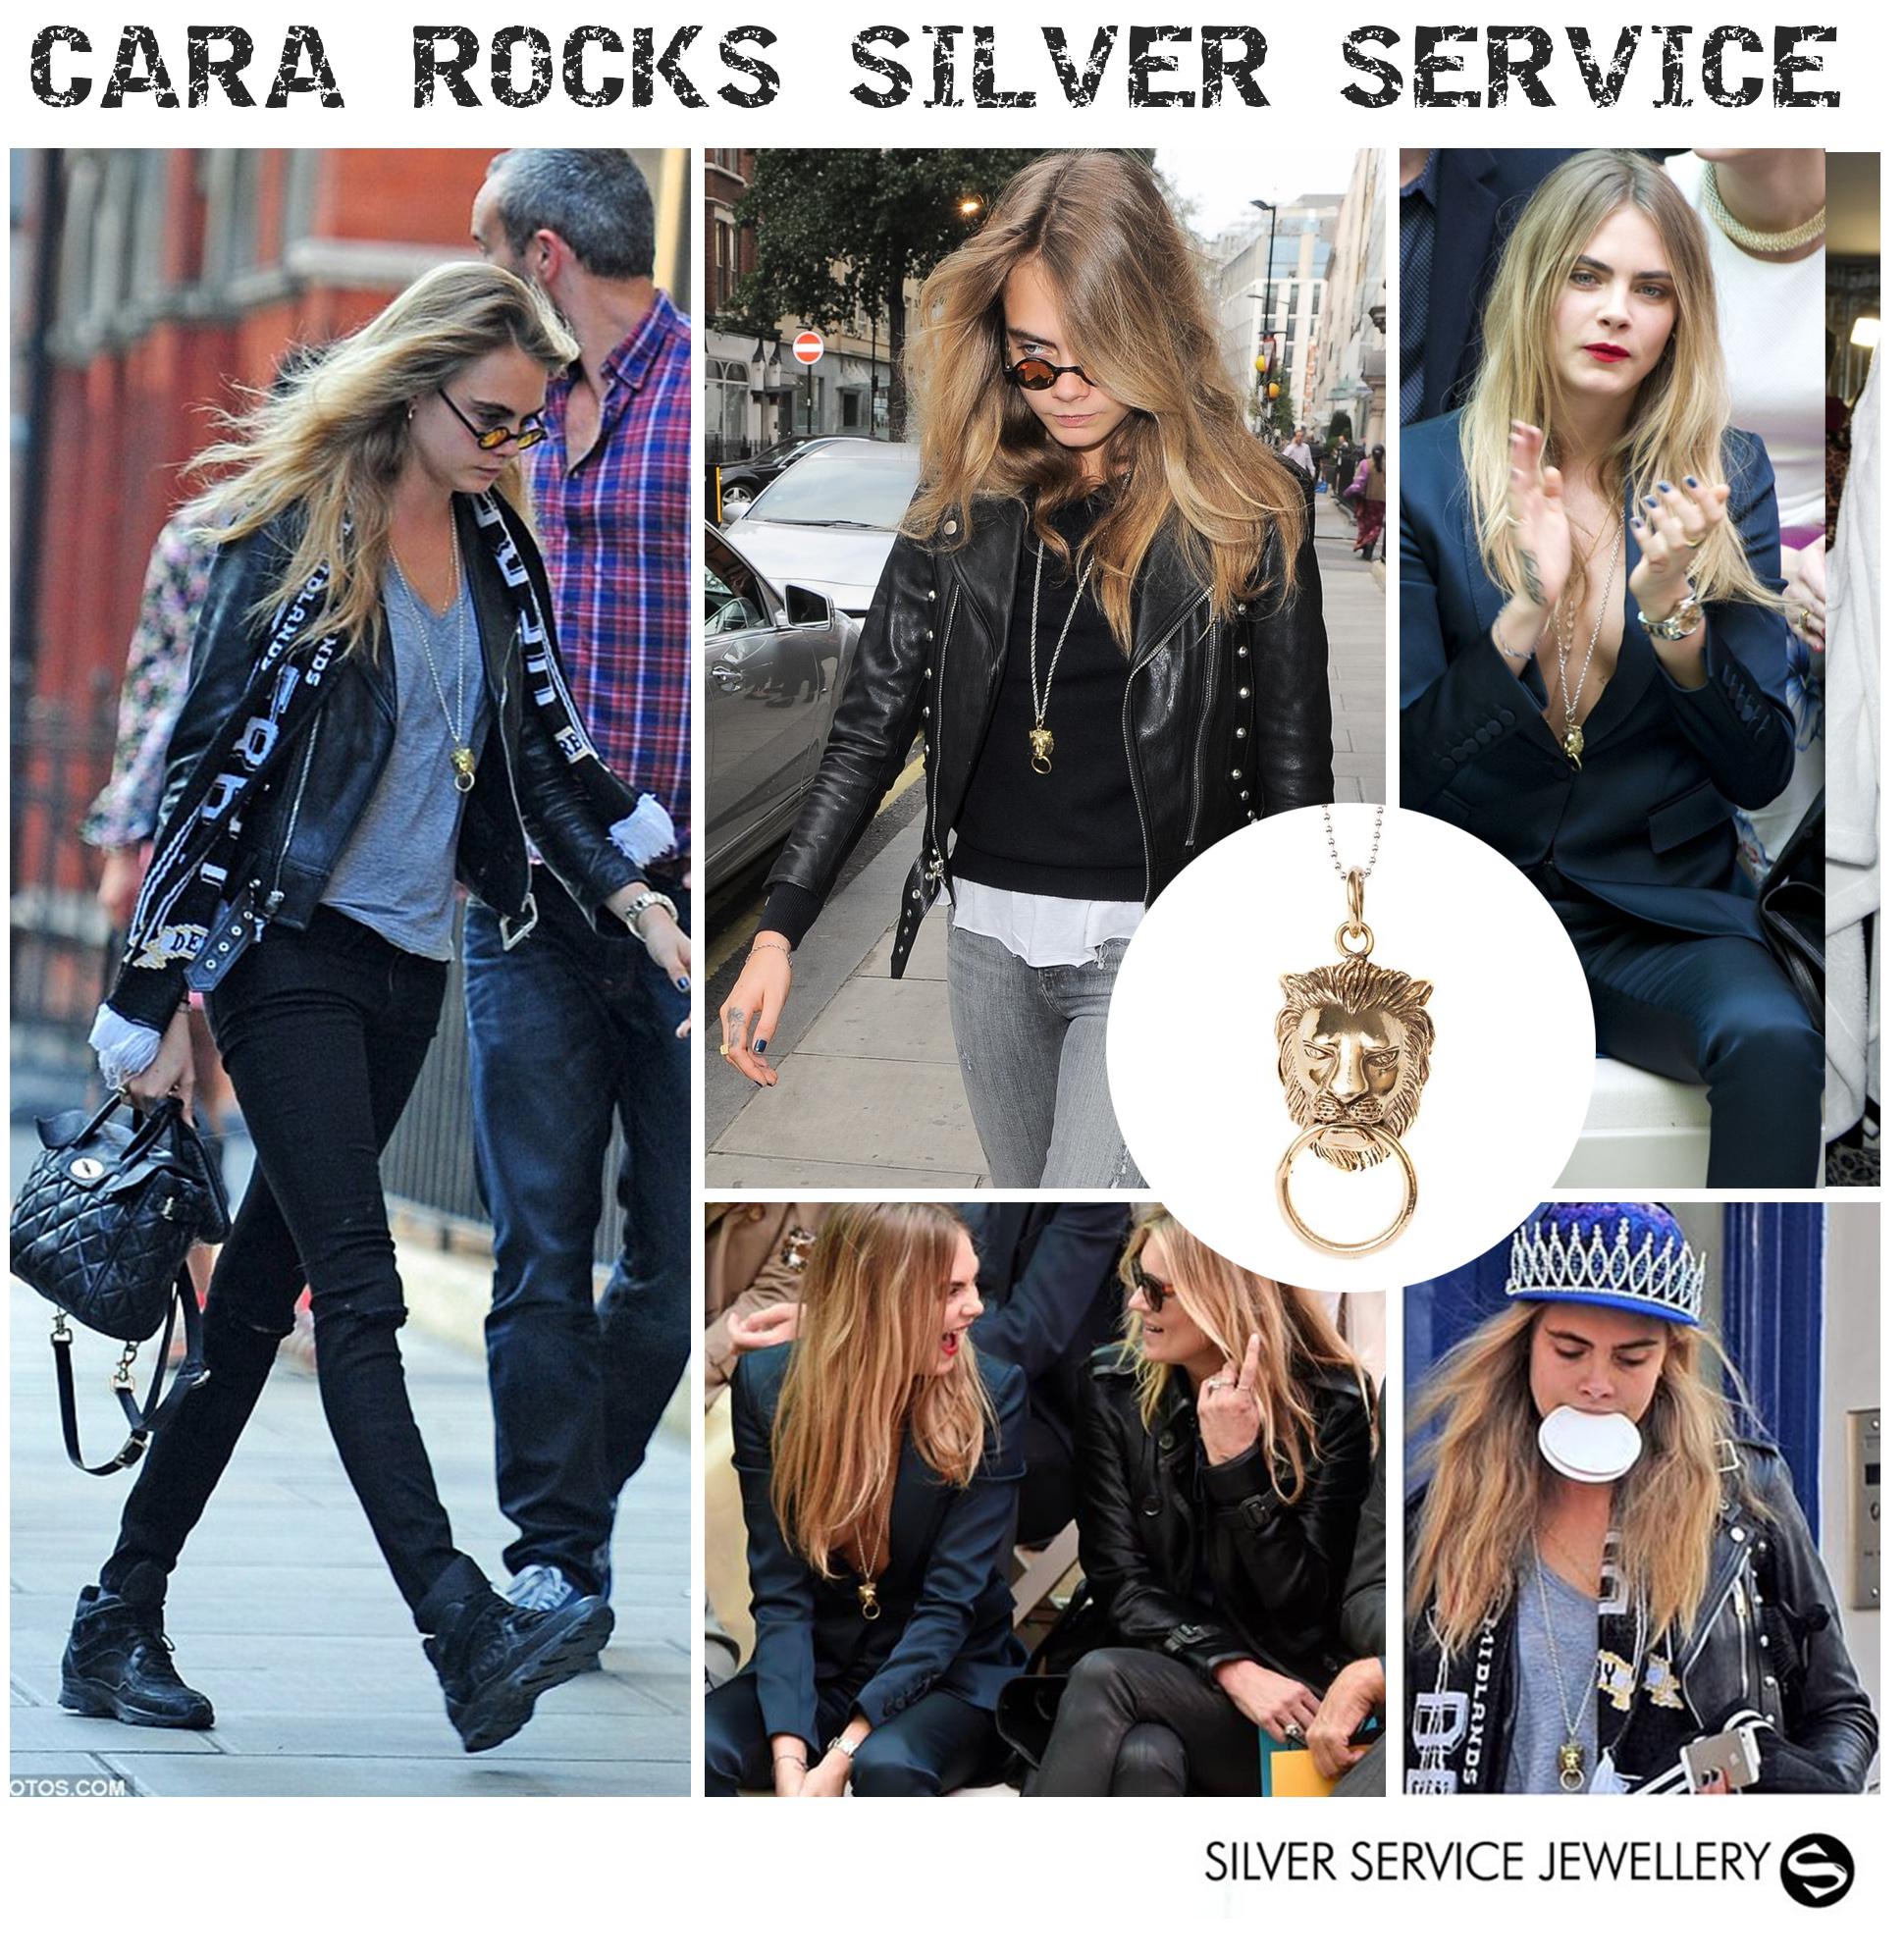 Cara Rocks Silver Service